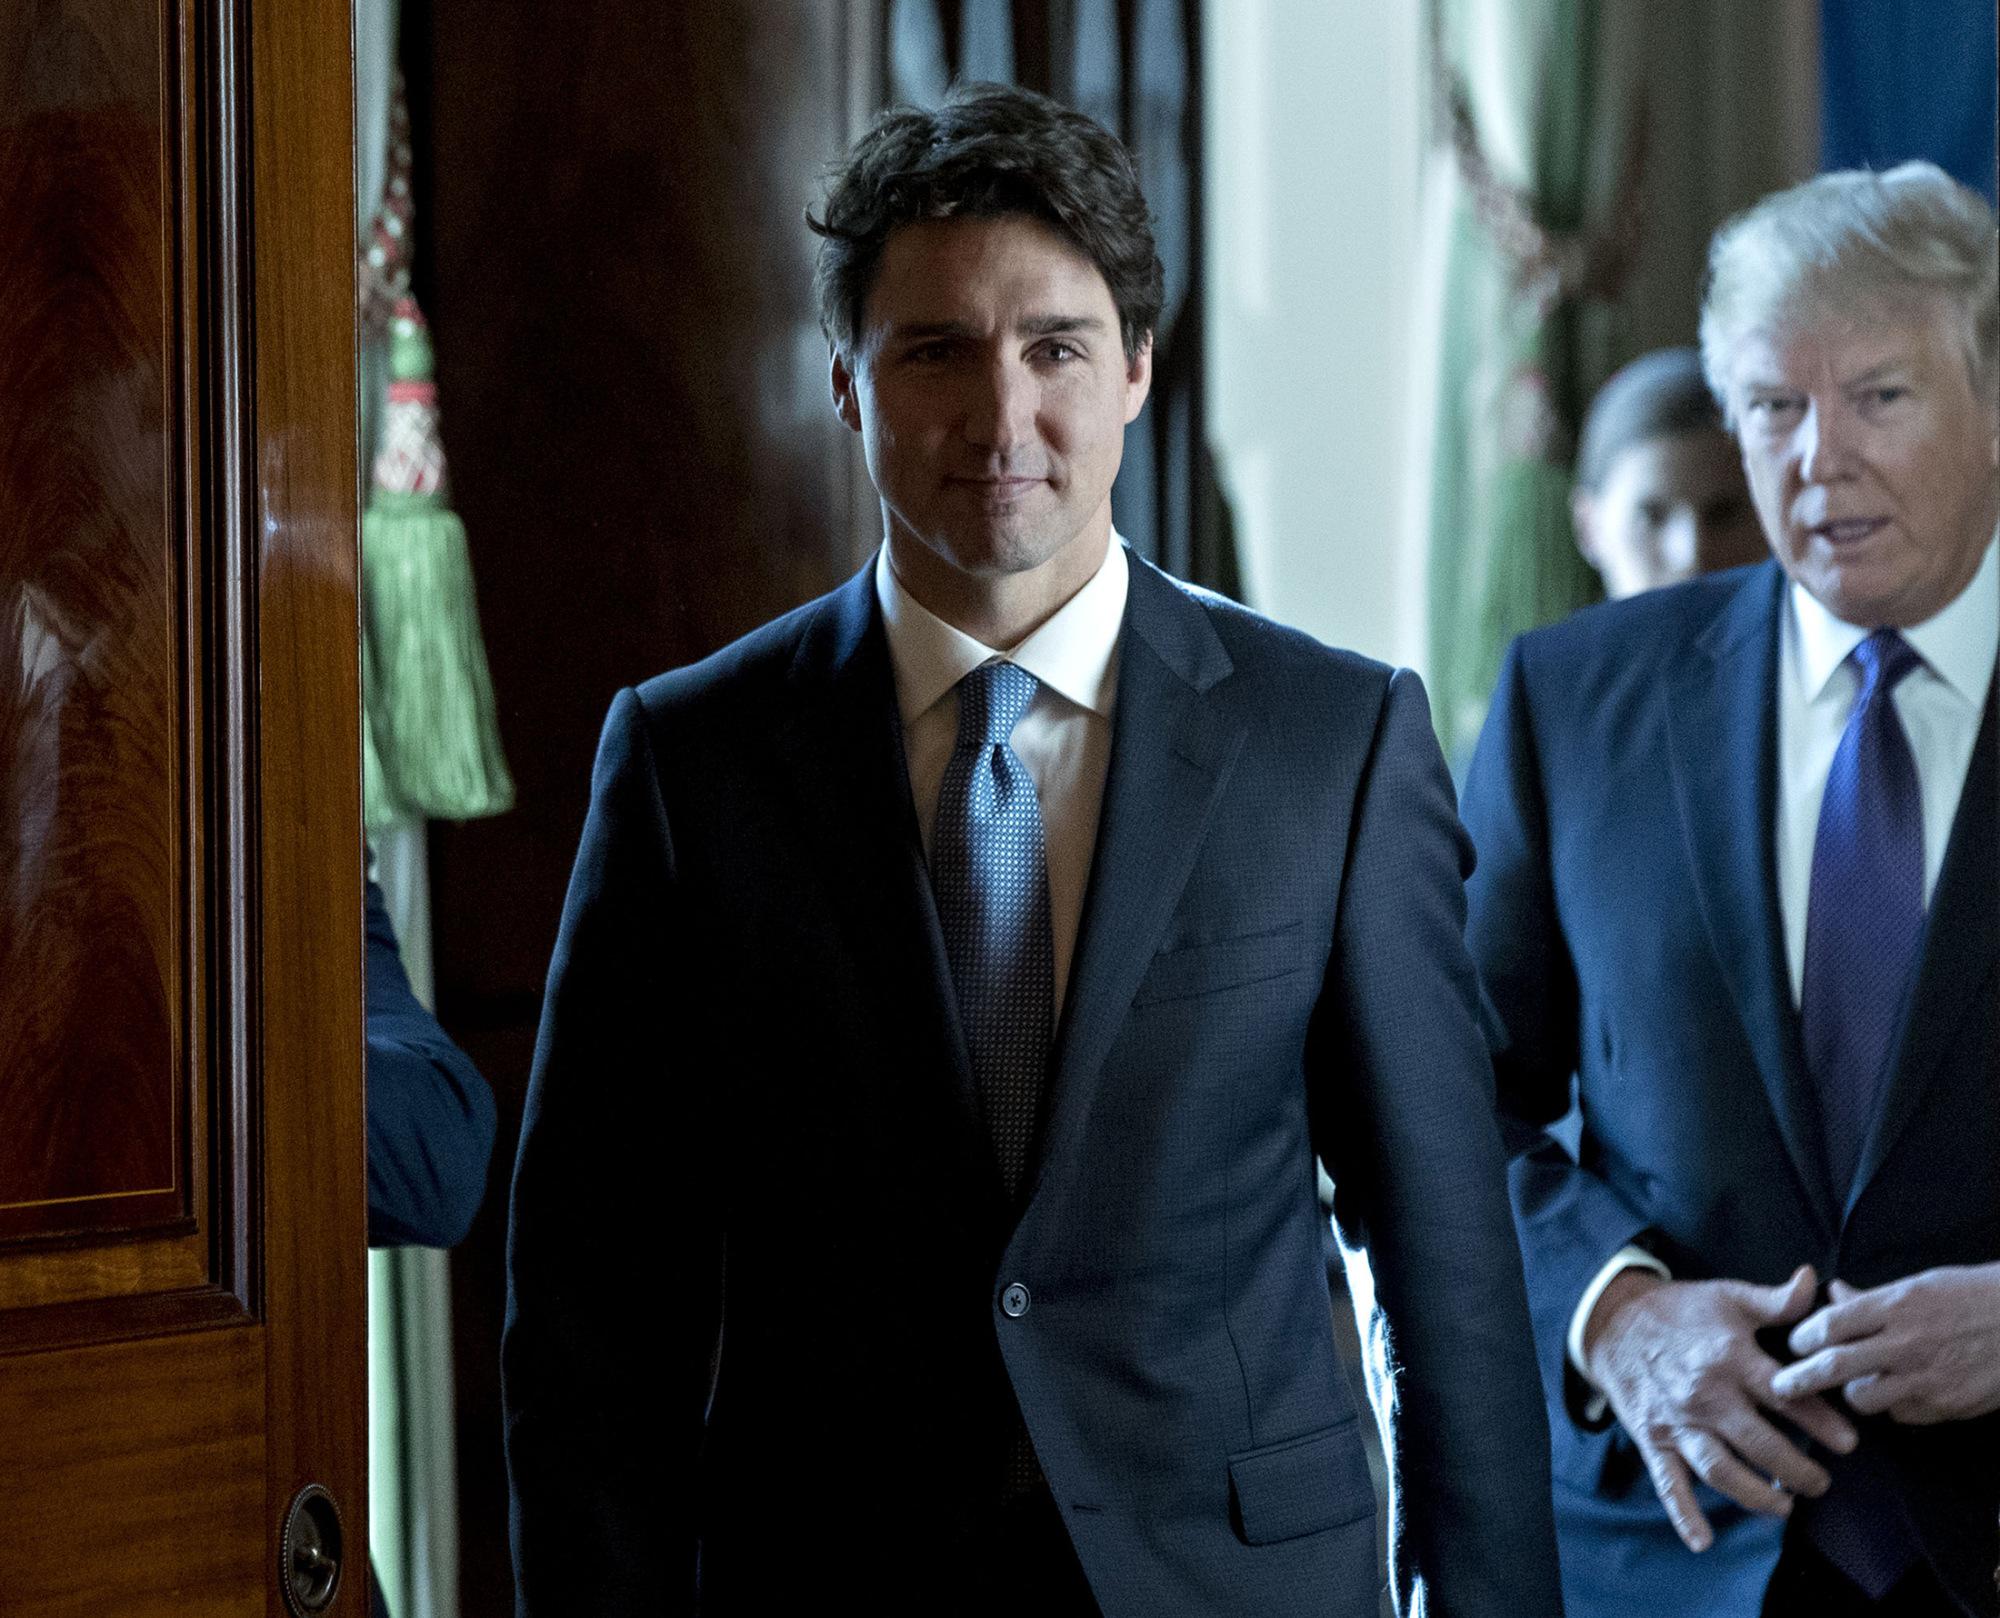 Nafta 'Tweak' Aside, Trudeau Gets What He Wants From Trump Visit